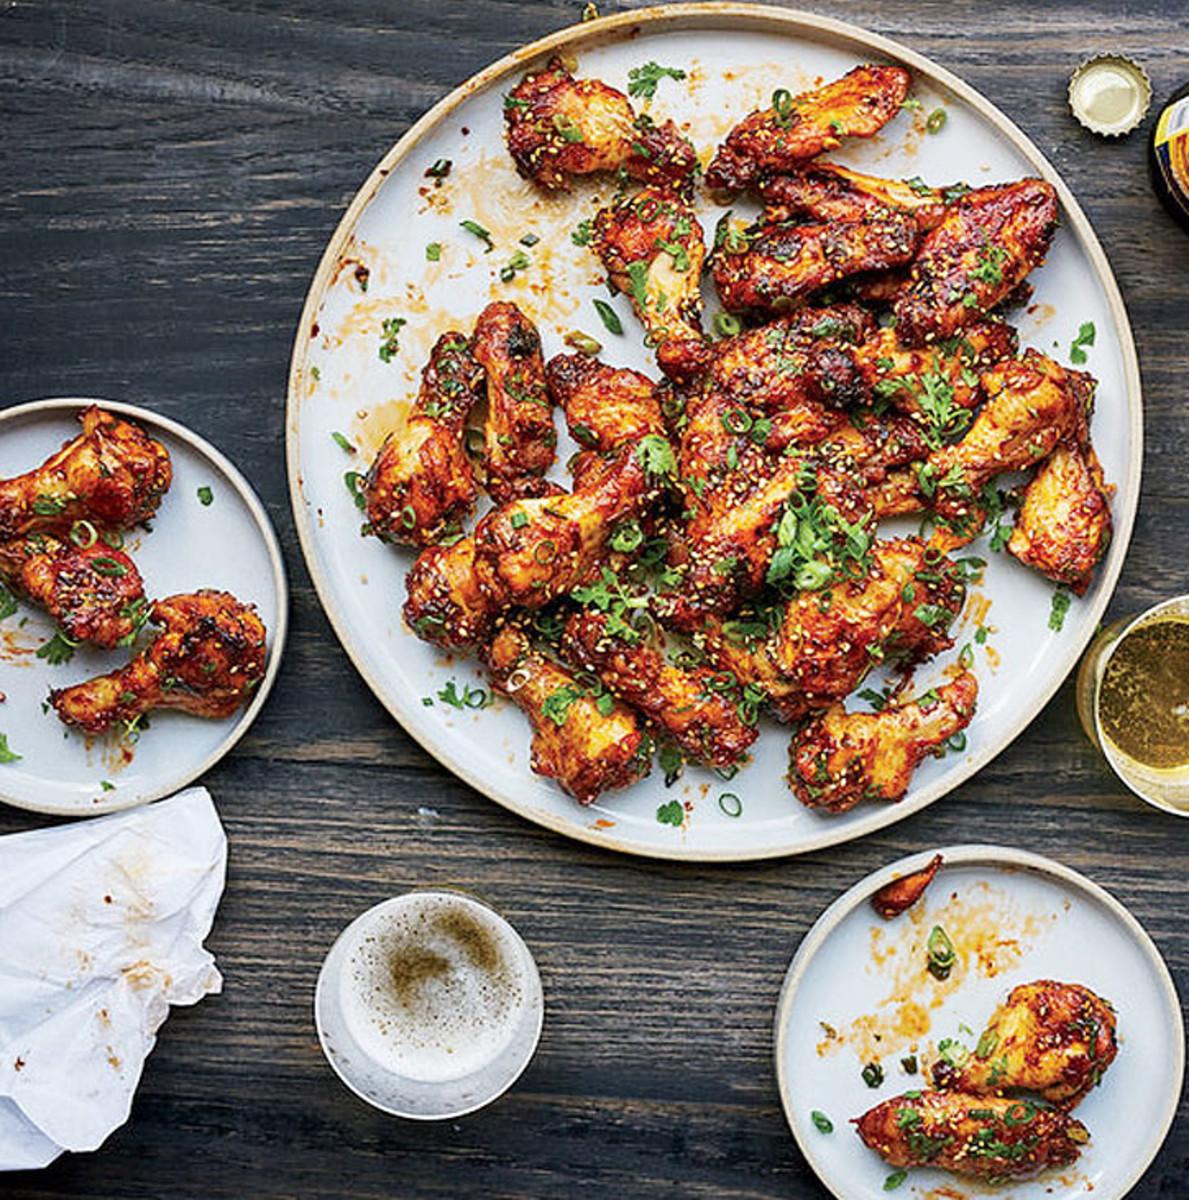 super-bowl-recipes-sticky-baked-chicken-wings-edit.jpg